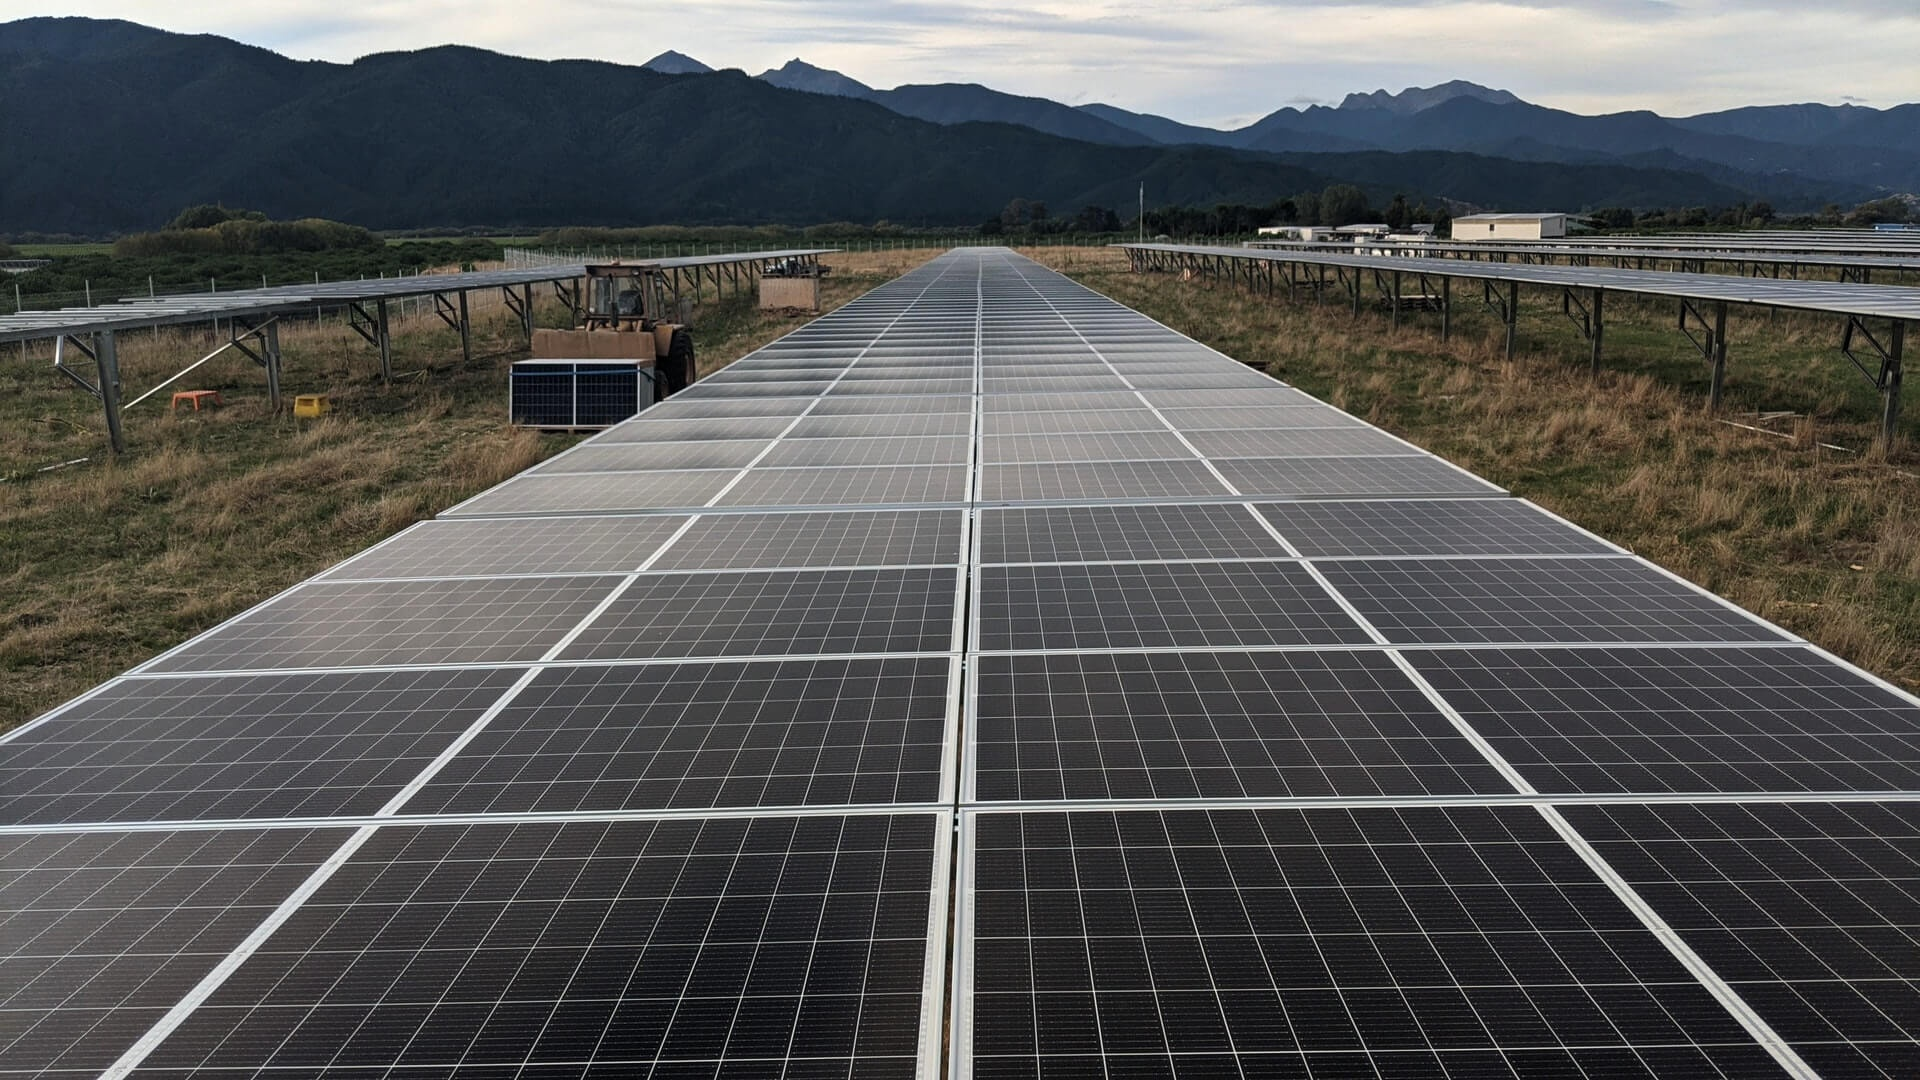 Solar Panels, Solar Array, Solar Energy, Solar Power, YSG Solar